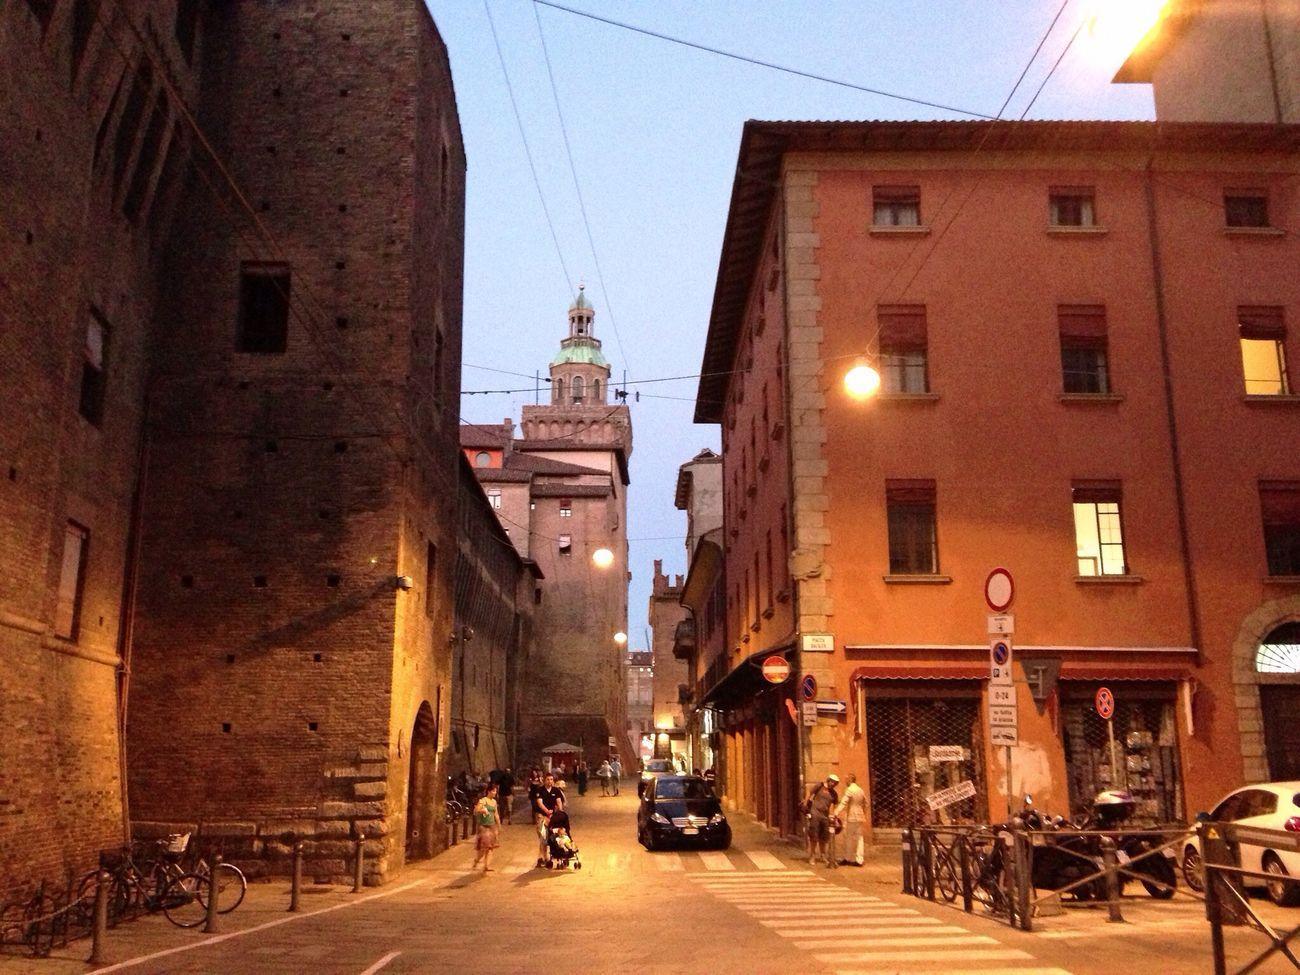 Bologna Streetphotography Walking Around City